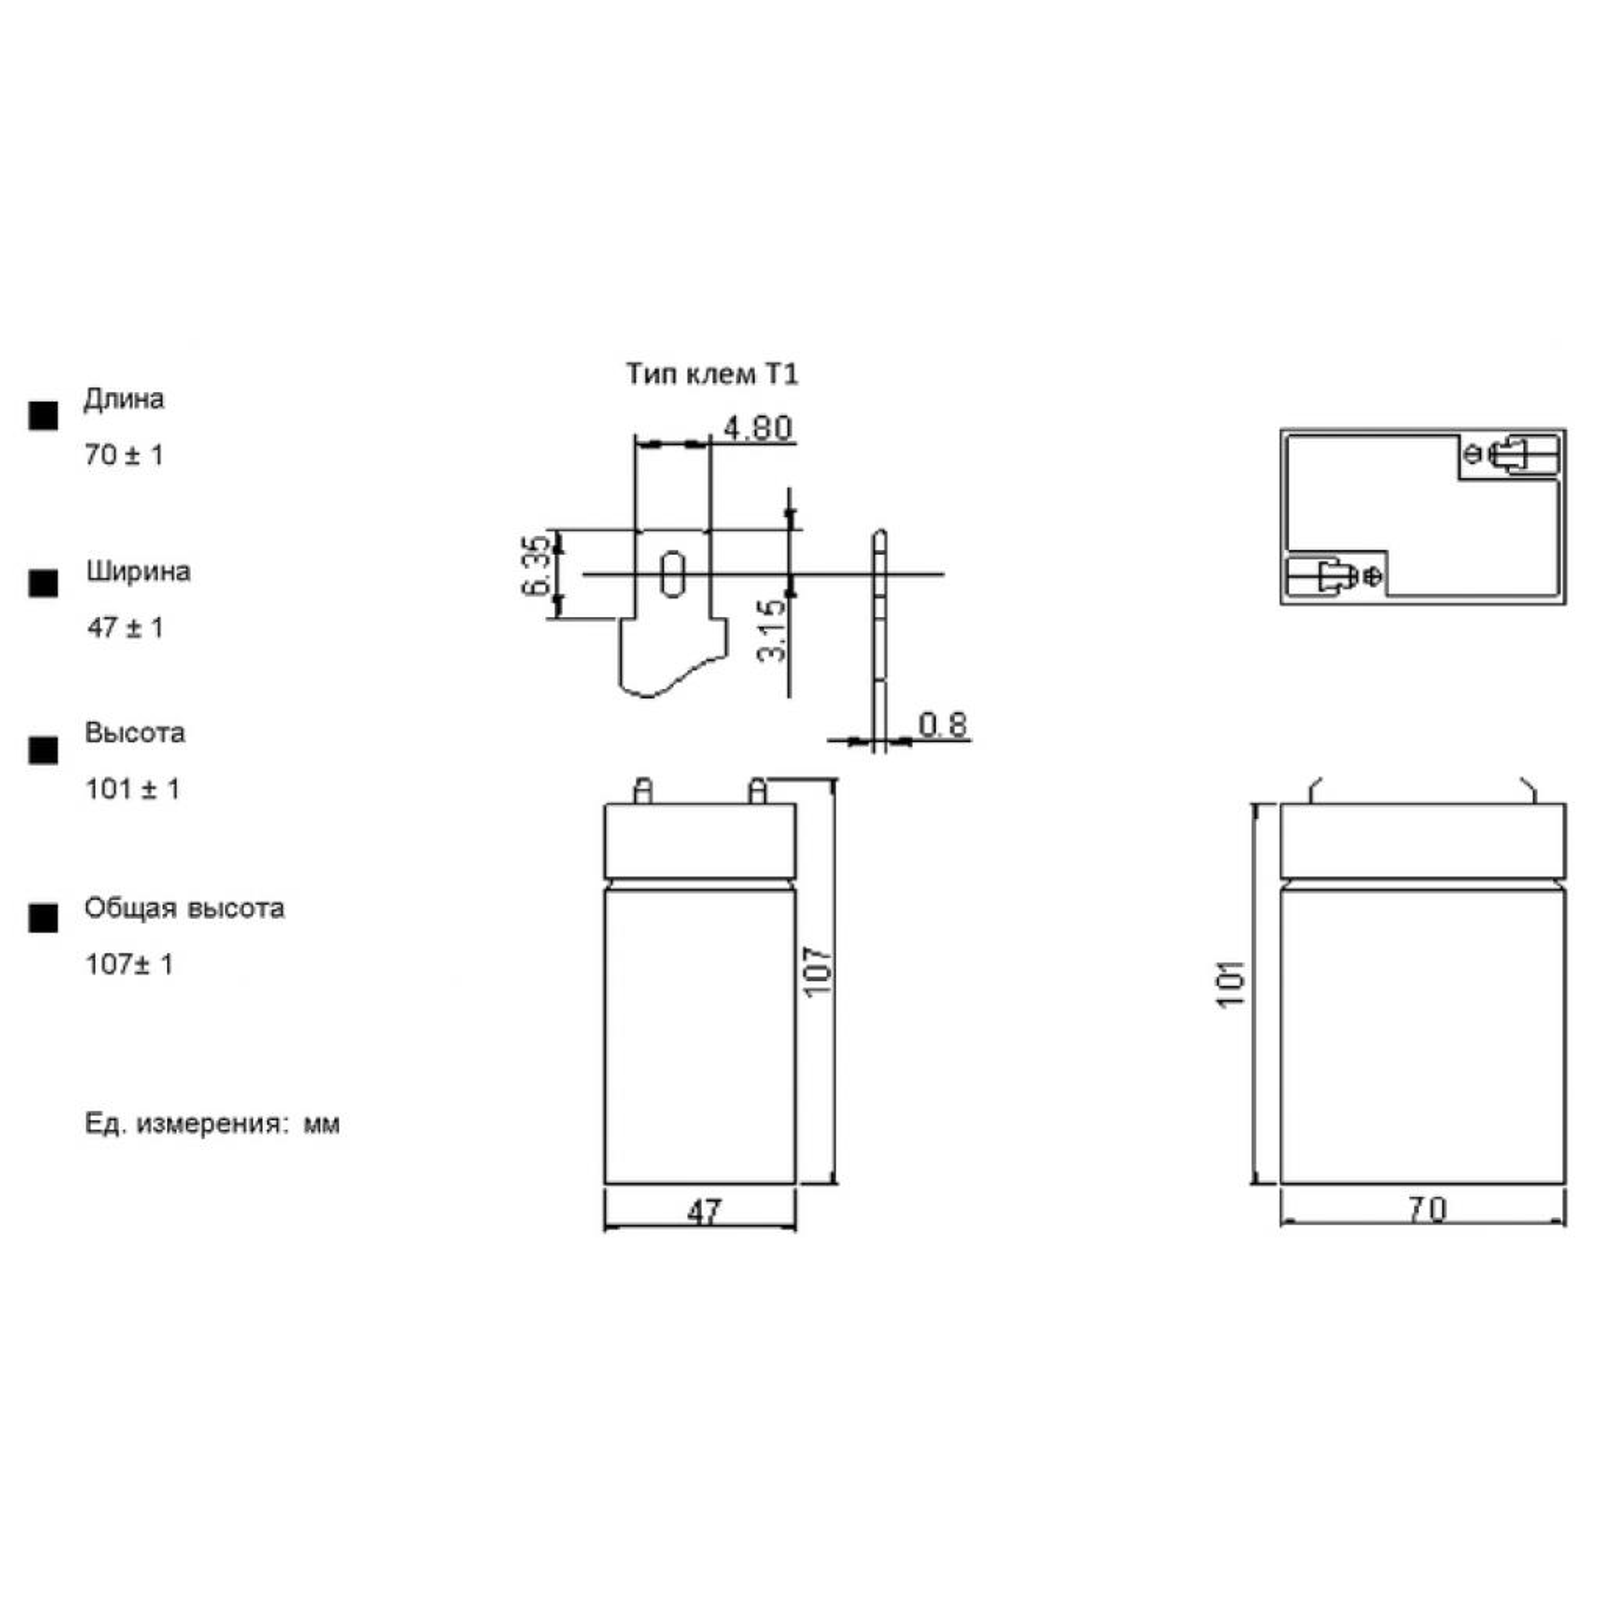 Батарея к ИБП PrologiX 6В 4.5 Ач (PS4.5-6) изображение 2